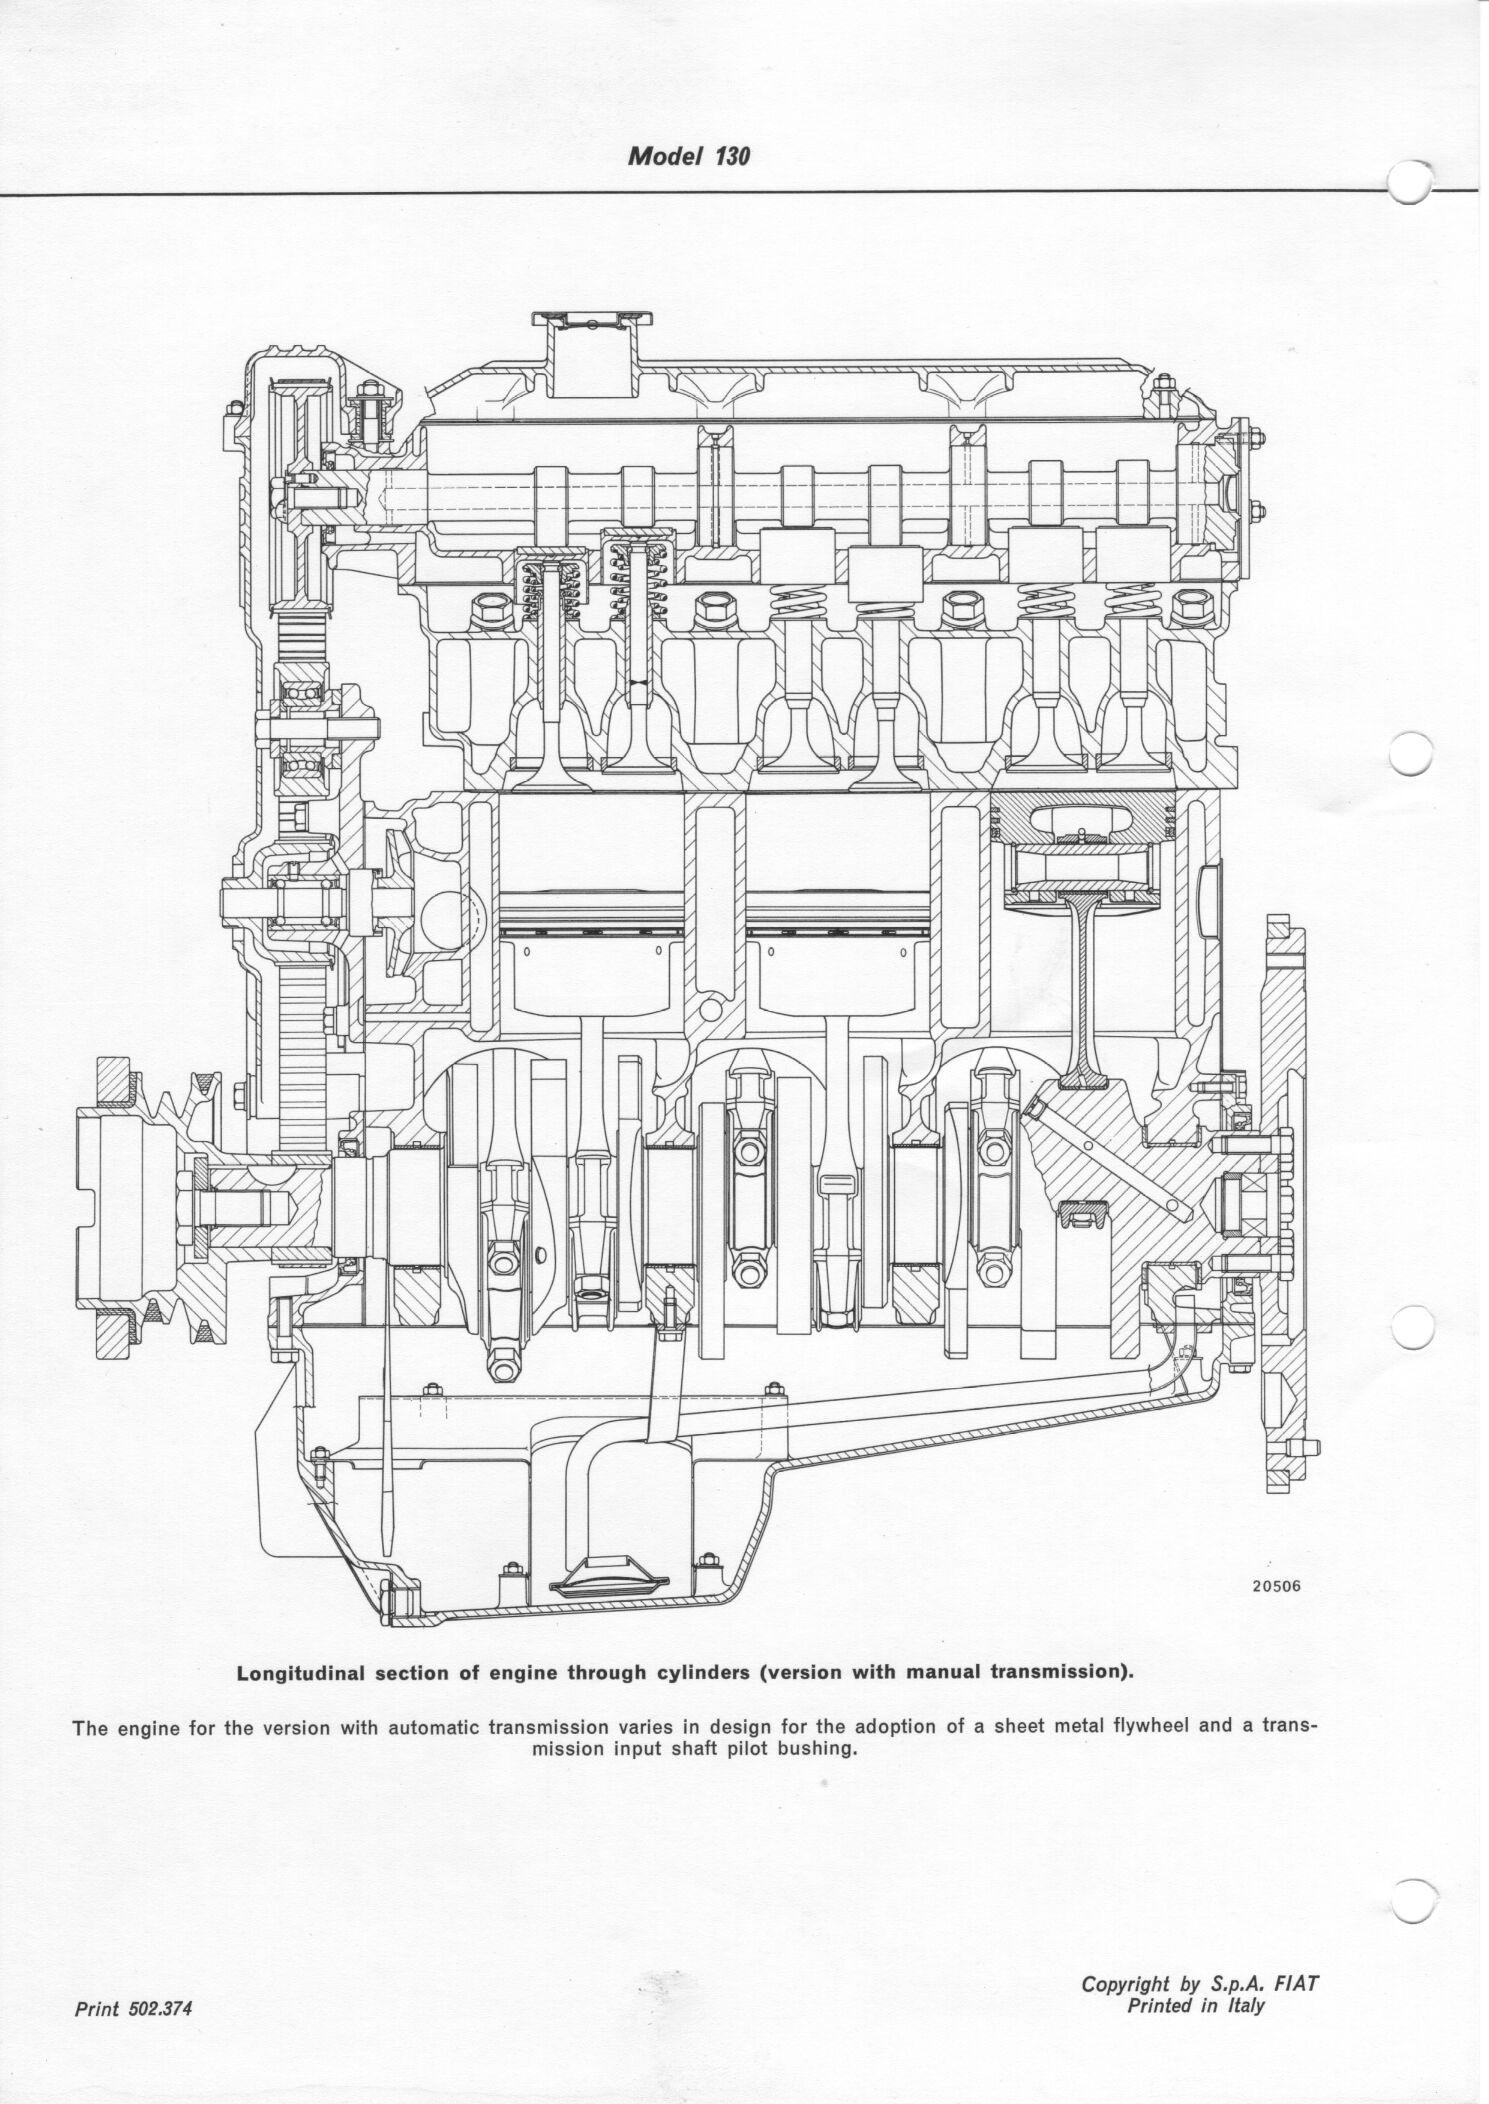 medium resolution of fiat 130 engine manual fiat 130 heaven diagram fiat manual fiat engine schematics